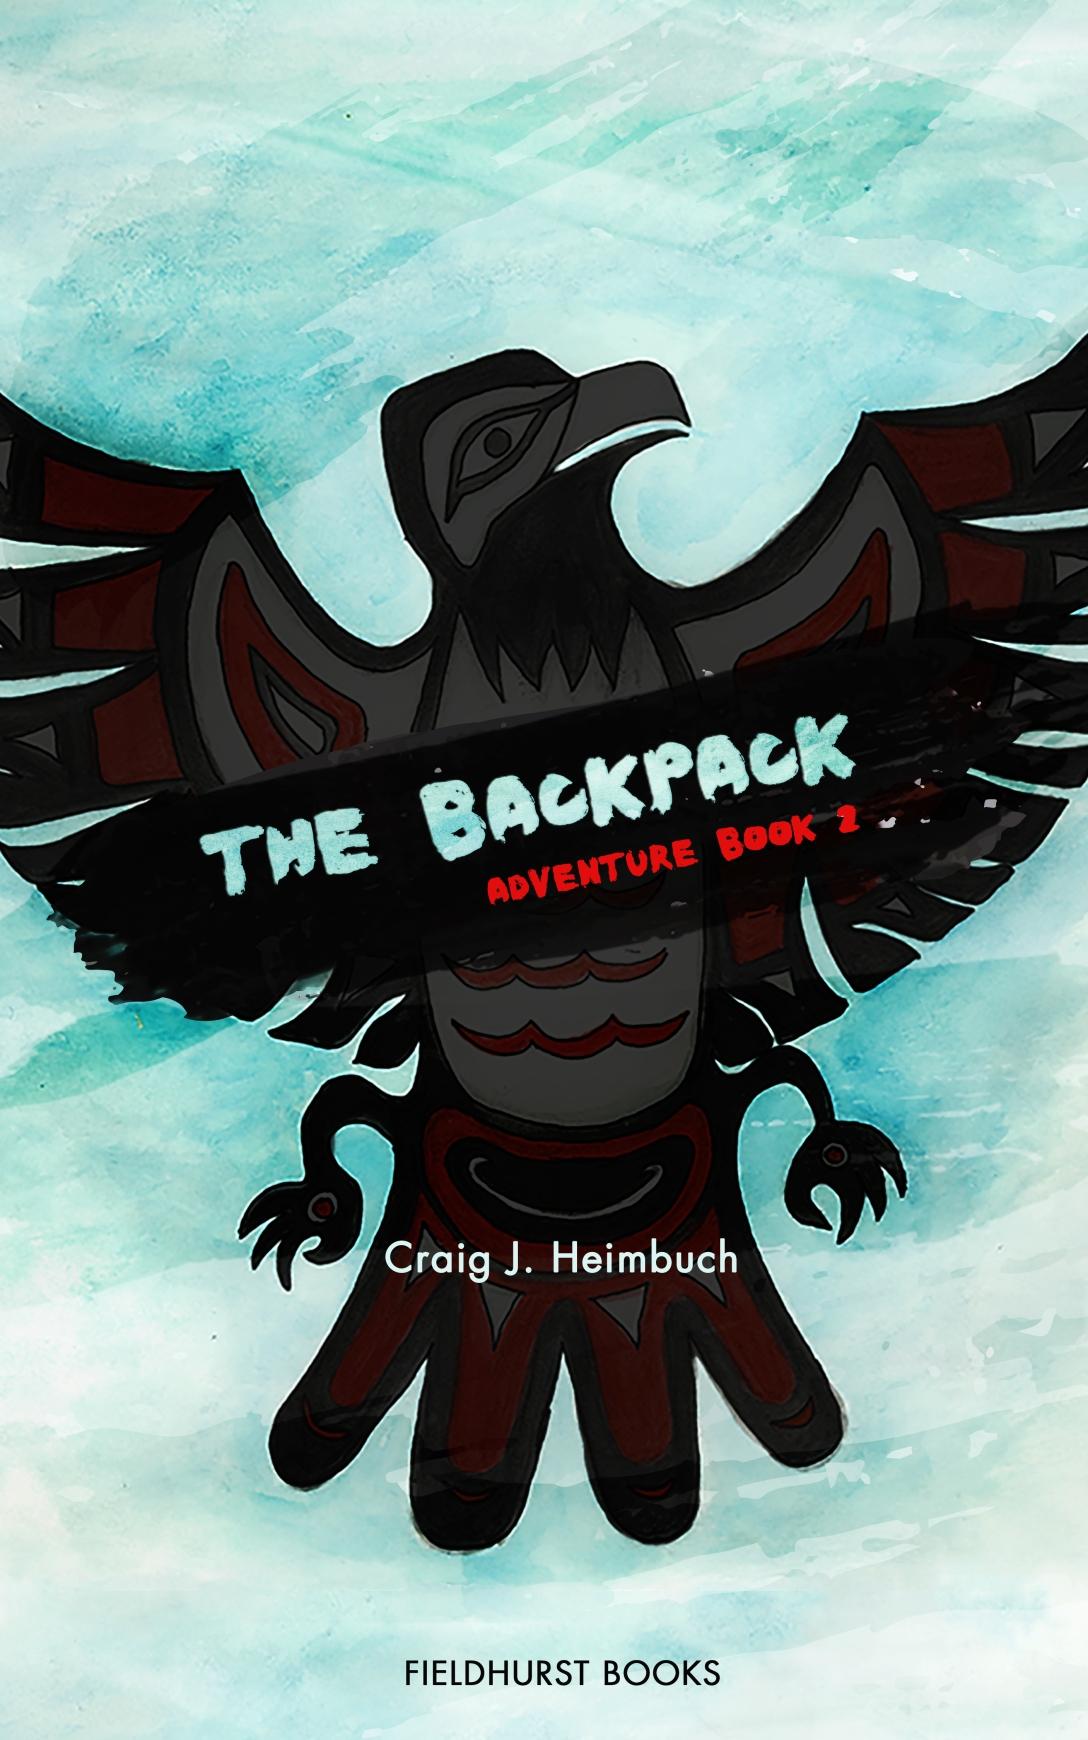 The_Backpack_Cover2.jpg